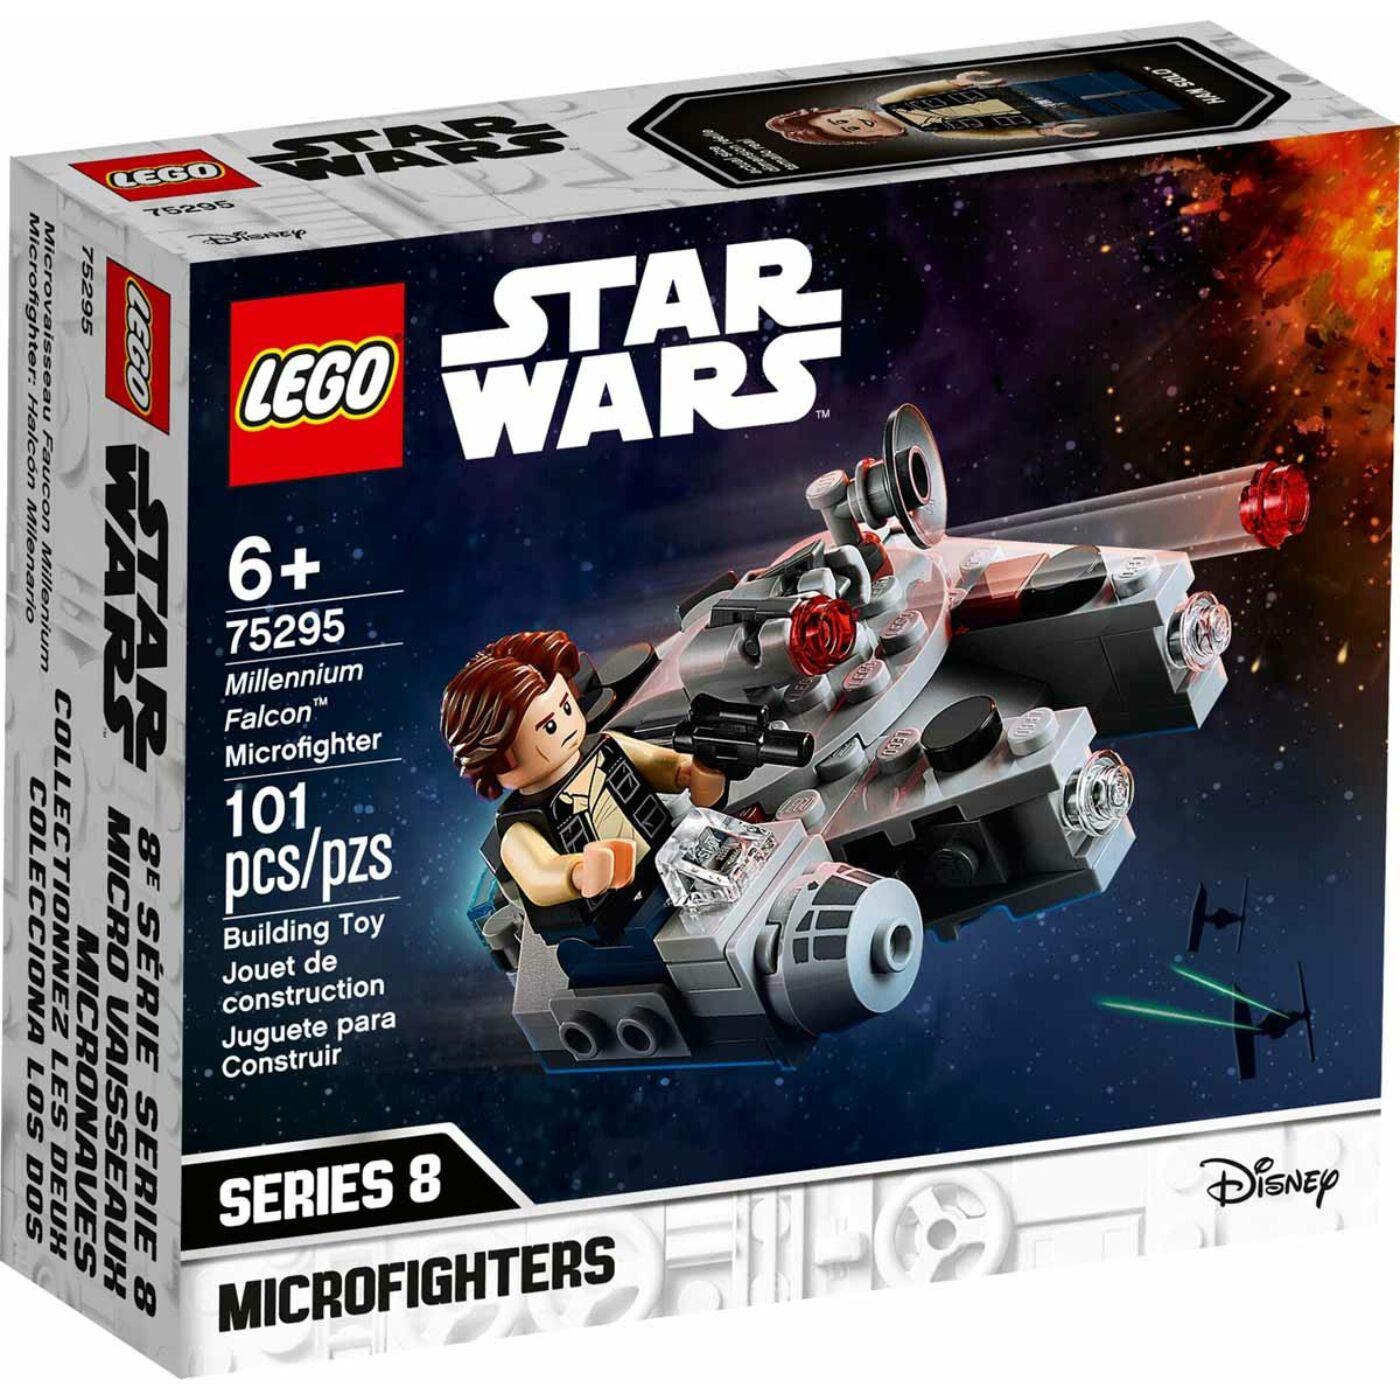 Lego Star Wars Millenium Falcon Microfighter